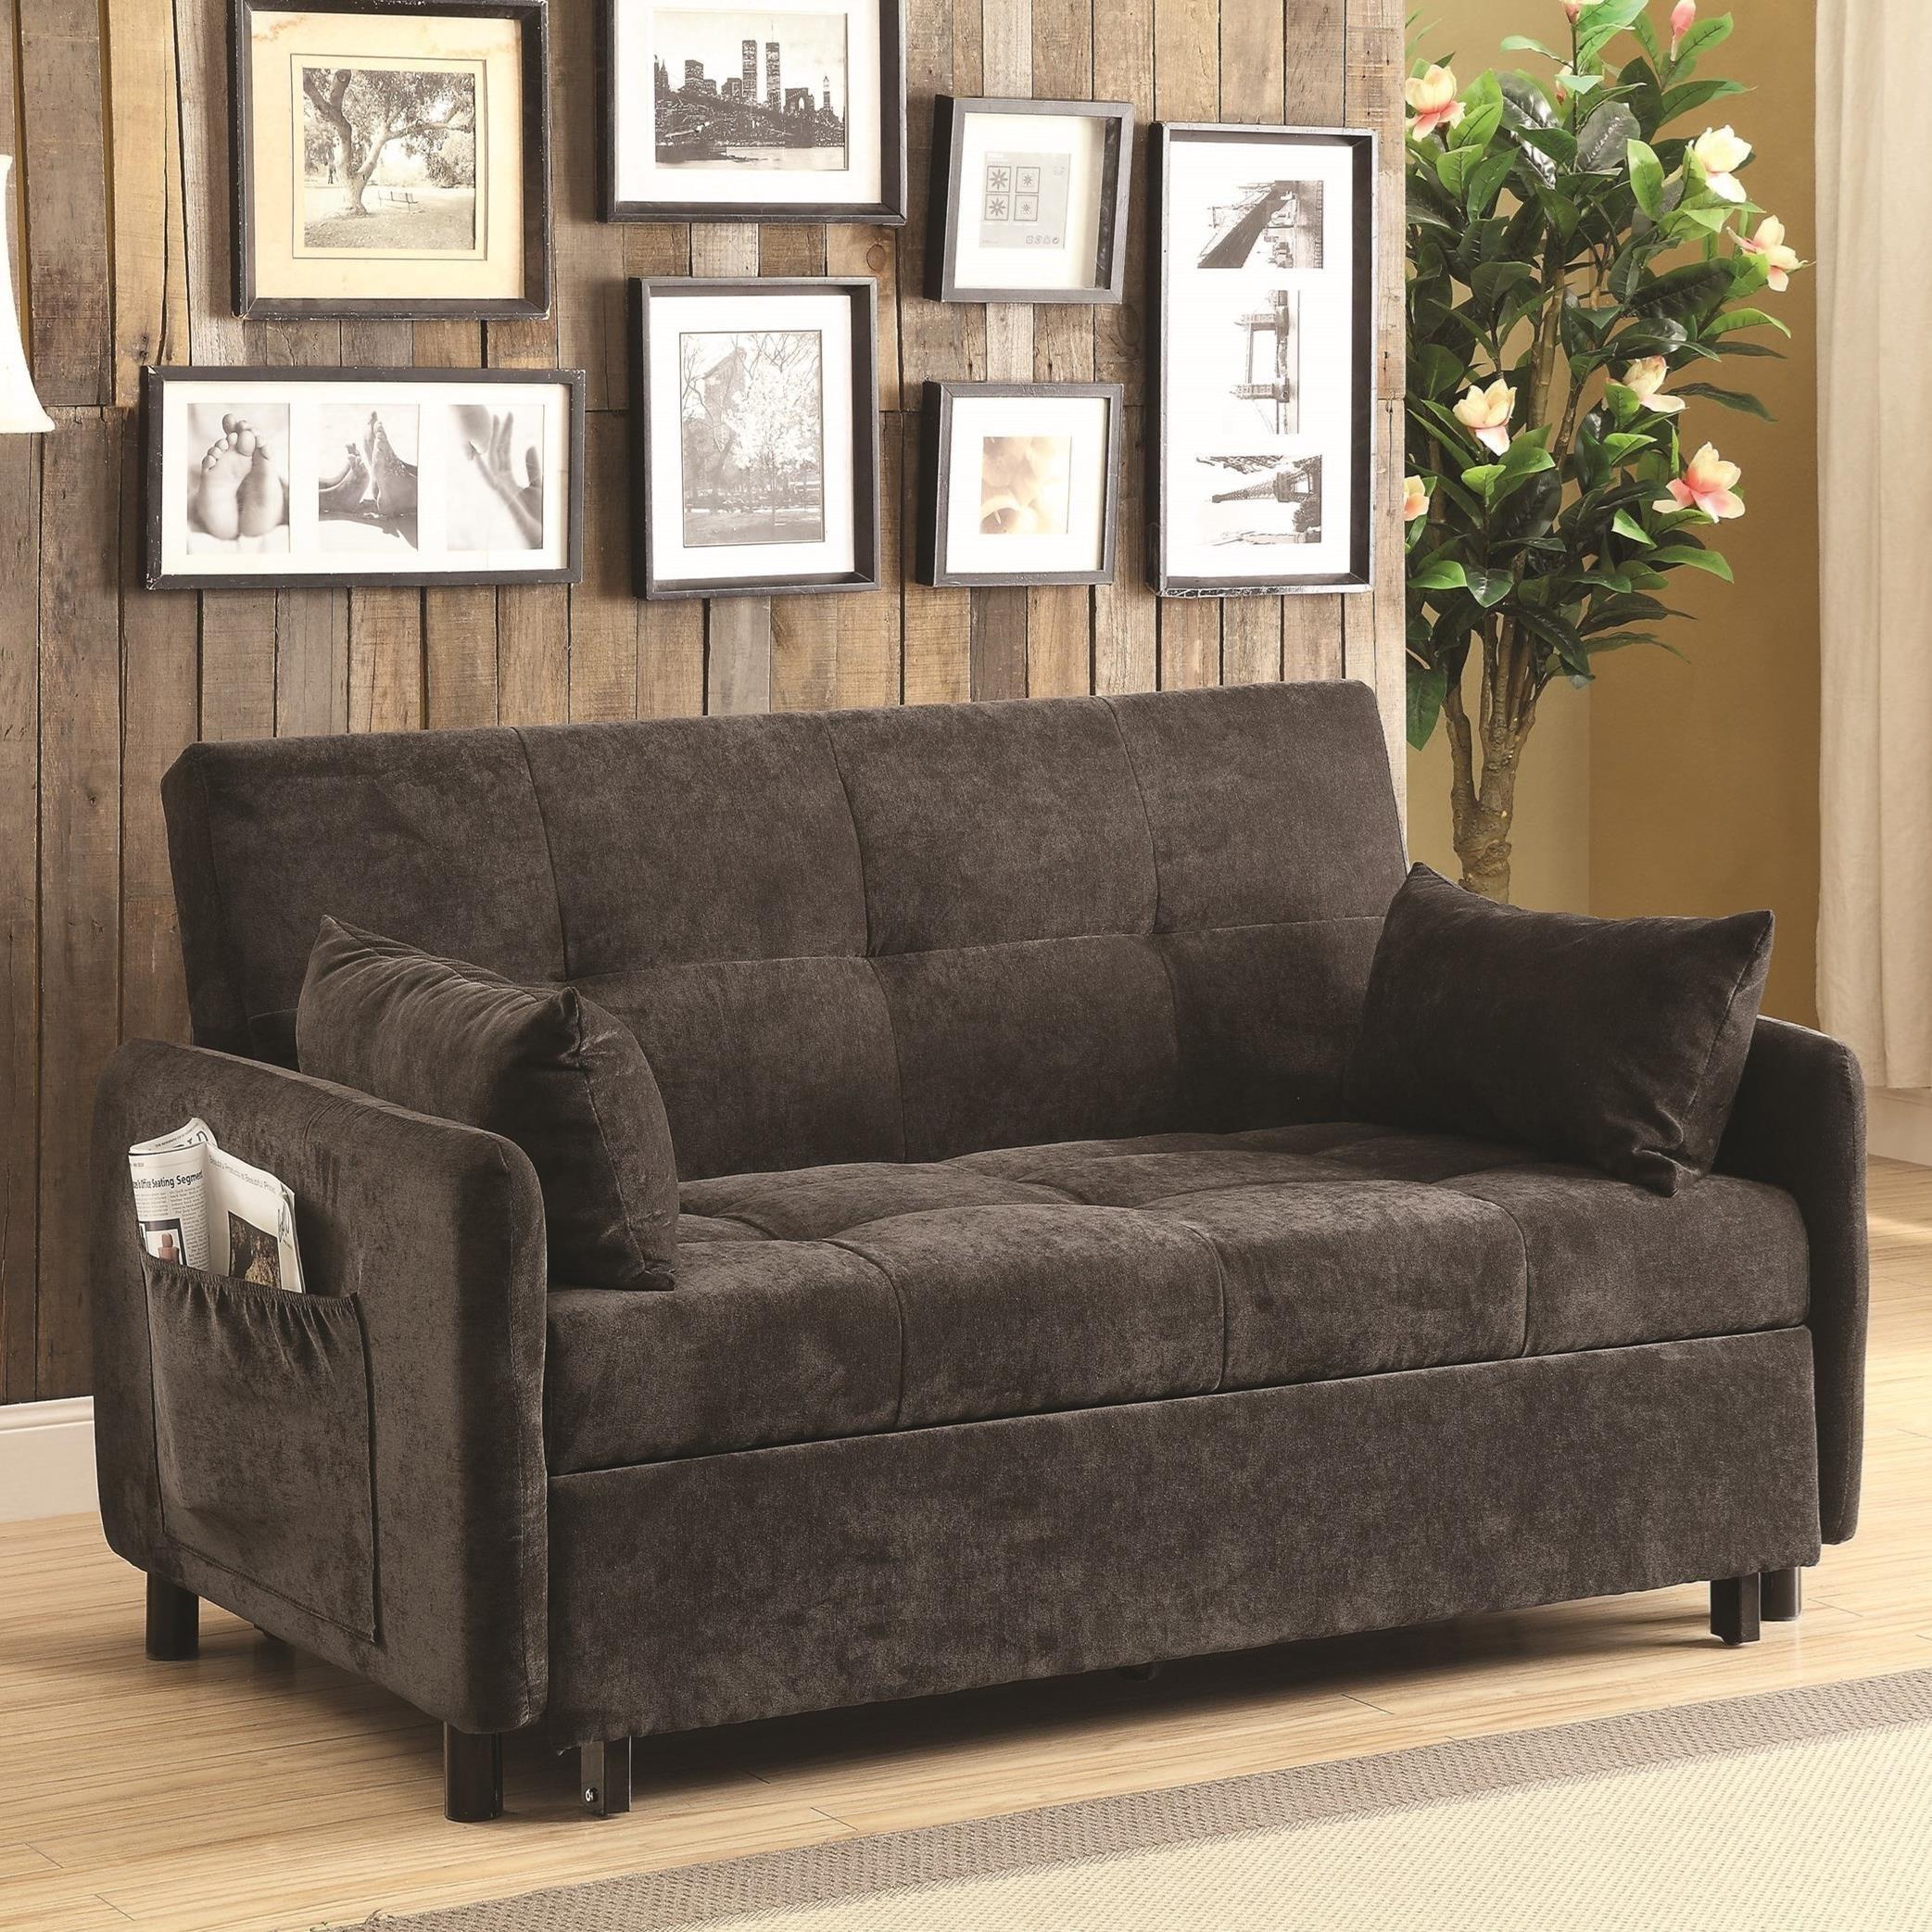 coaster futons 551075 dark brown sofa bed dunk bright furniture rh dunkandbright com dark brown sofa decorating ideas dark brown sofa set